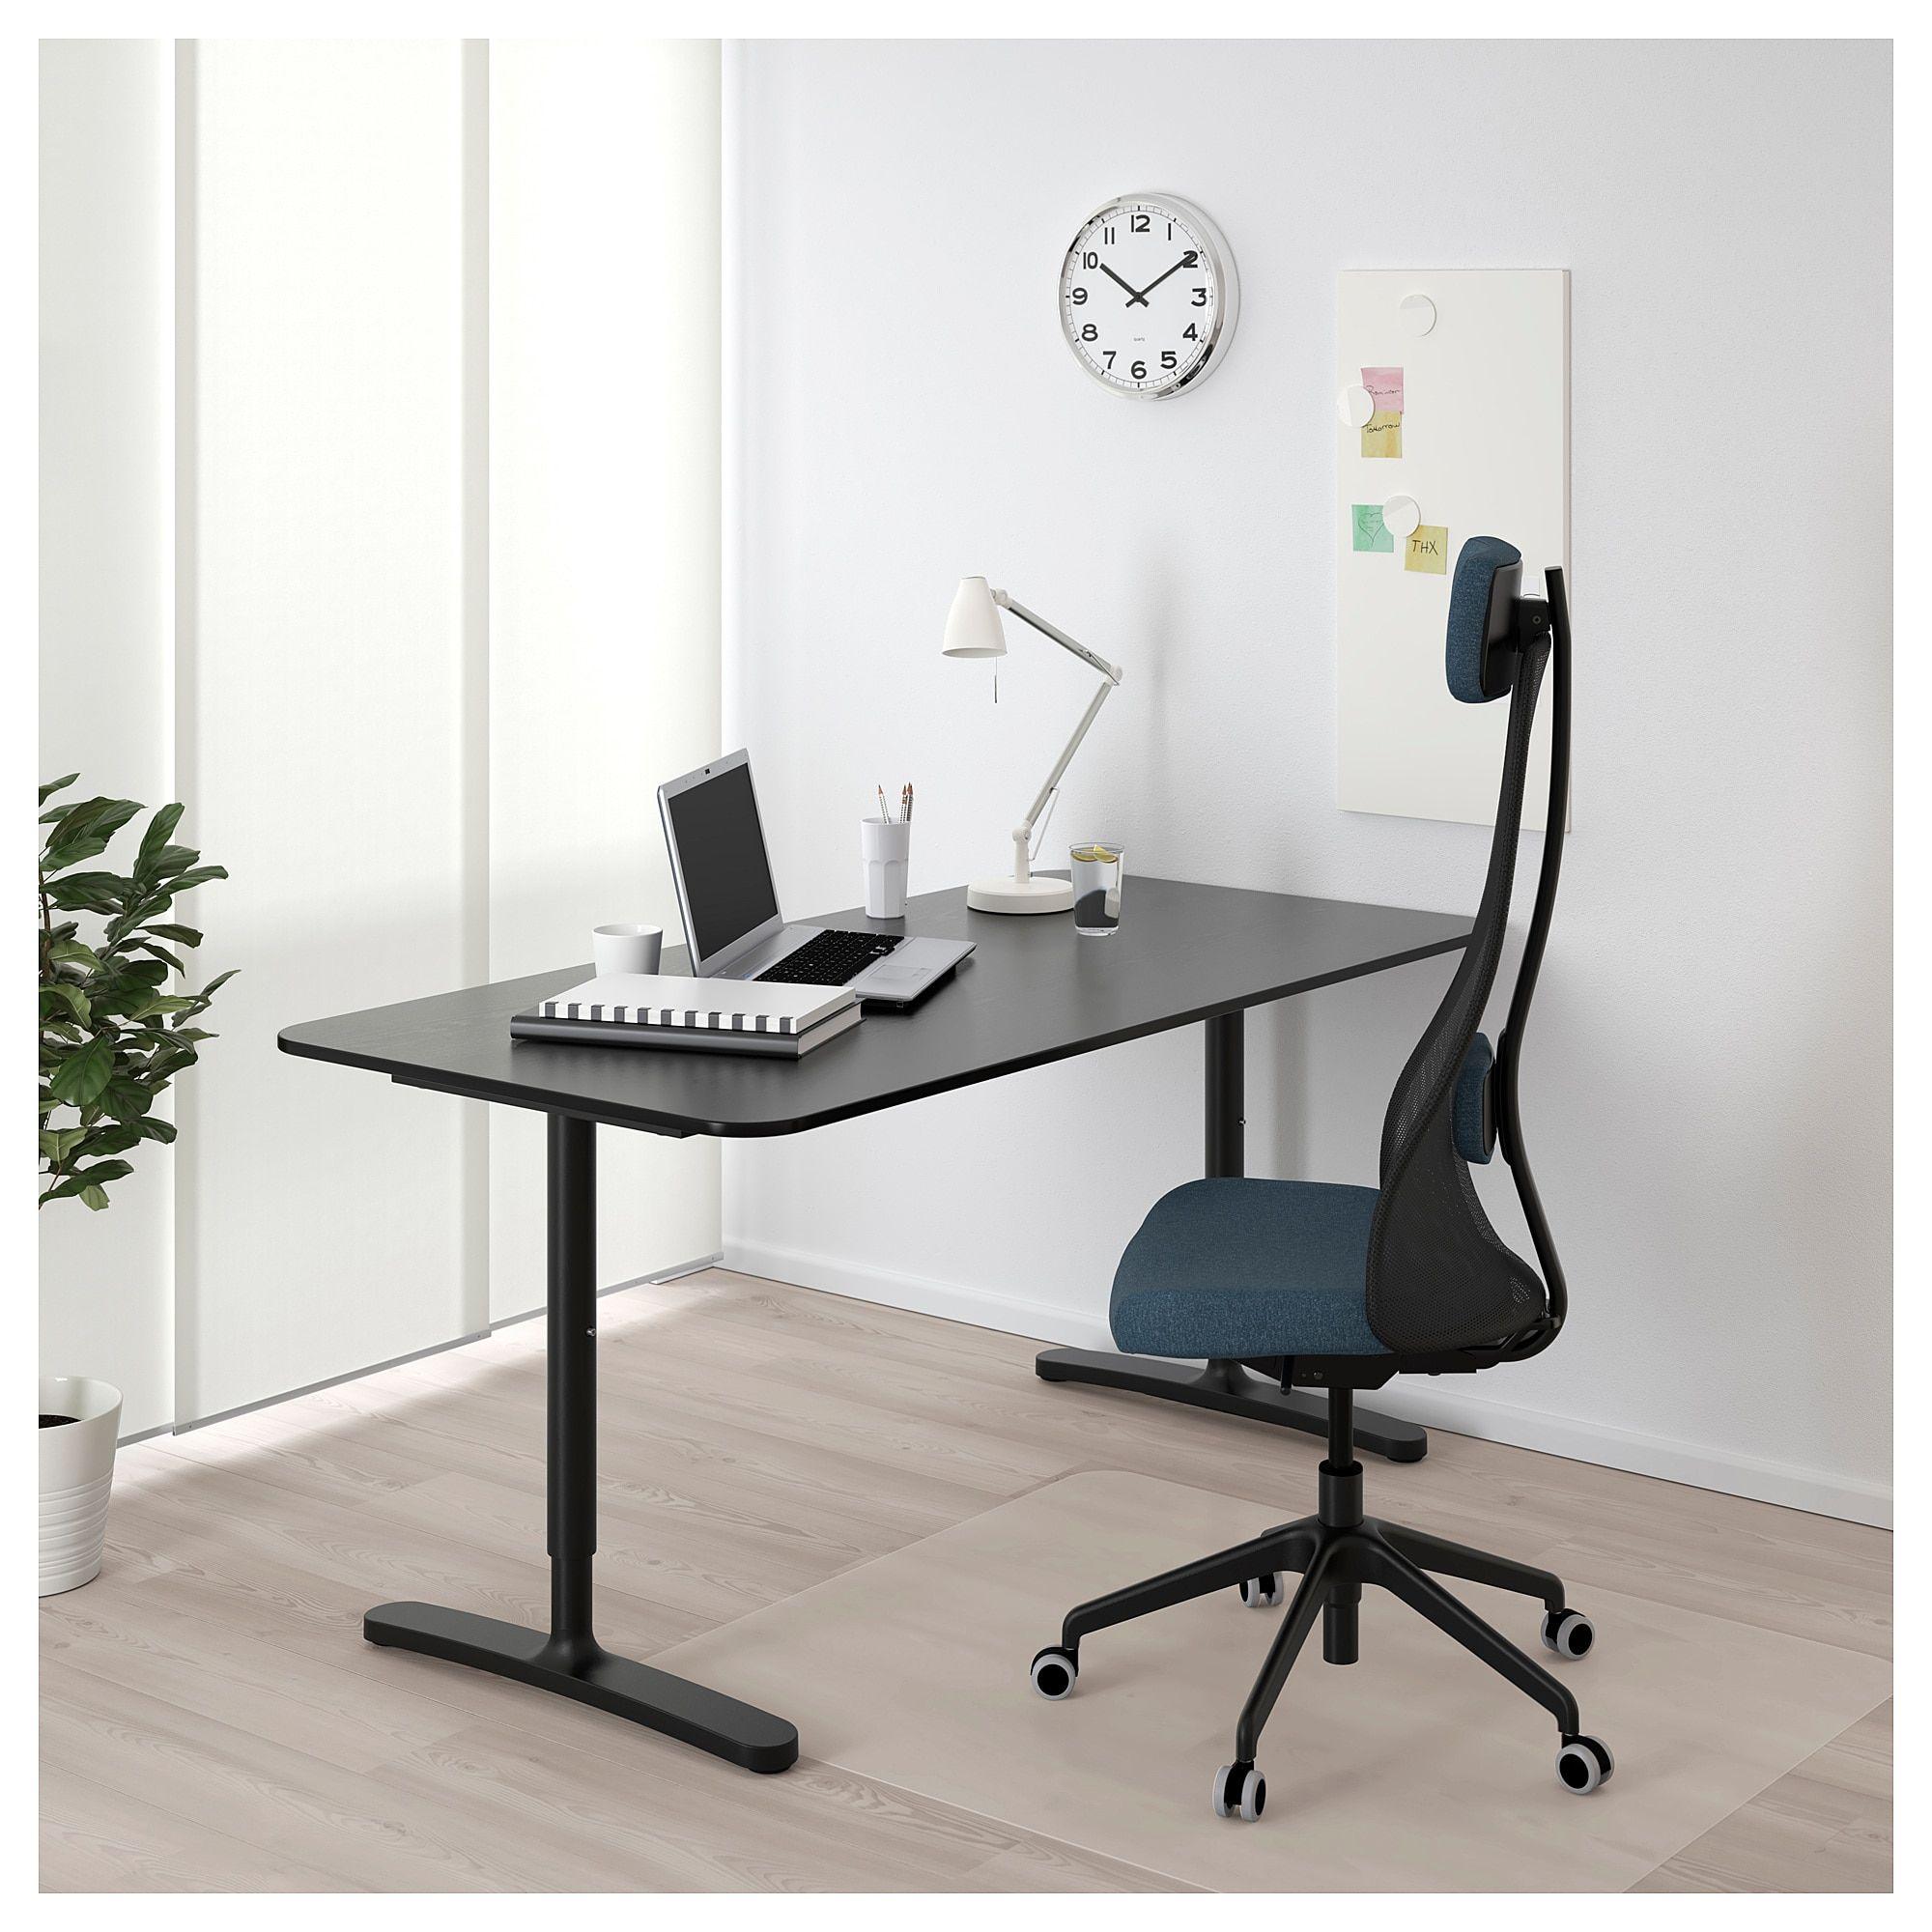 Ikea Bekant Desk Black Stained Ash Veneer Ikea Bekant Ikea White Desks